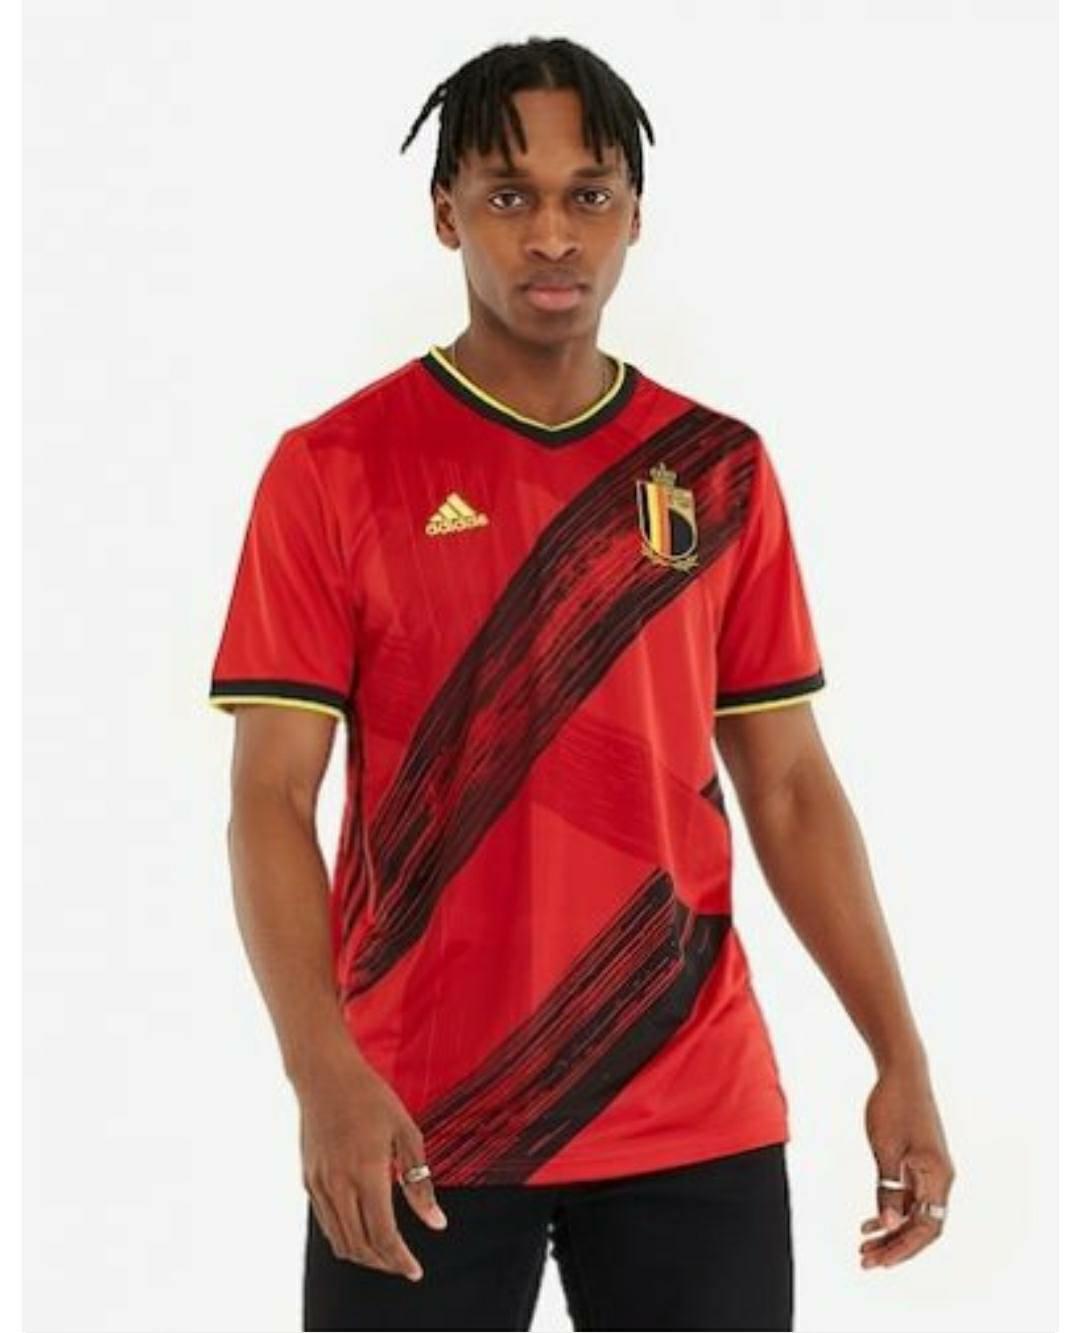 jual jersey bola terbaru, kaos bola belgia, jersey belgia terbaru, kaos bola belgia, baju bola terpercaya